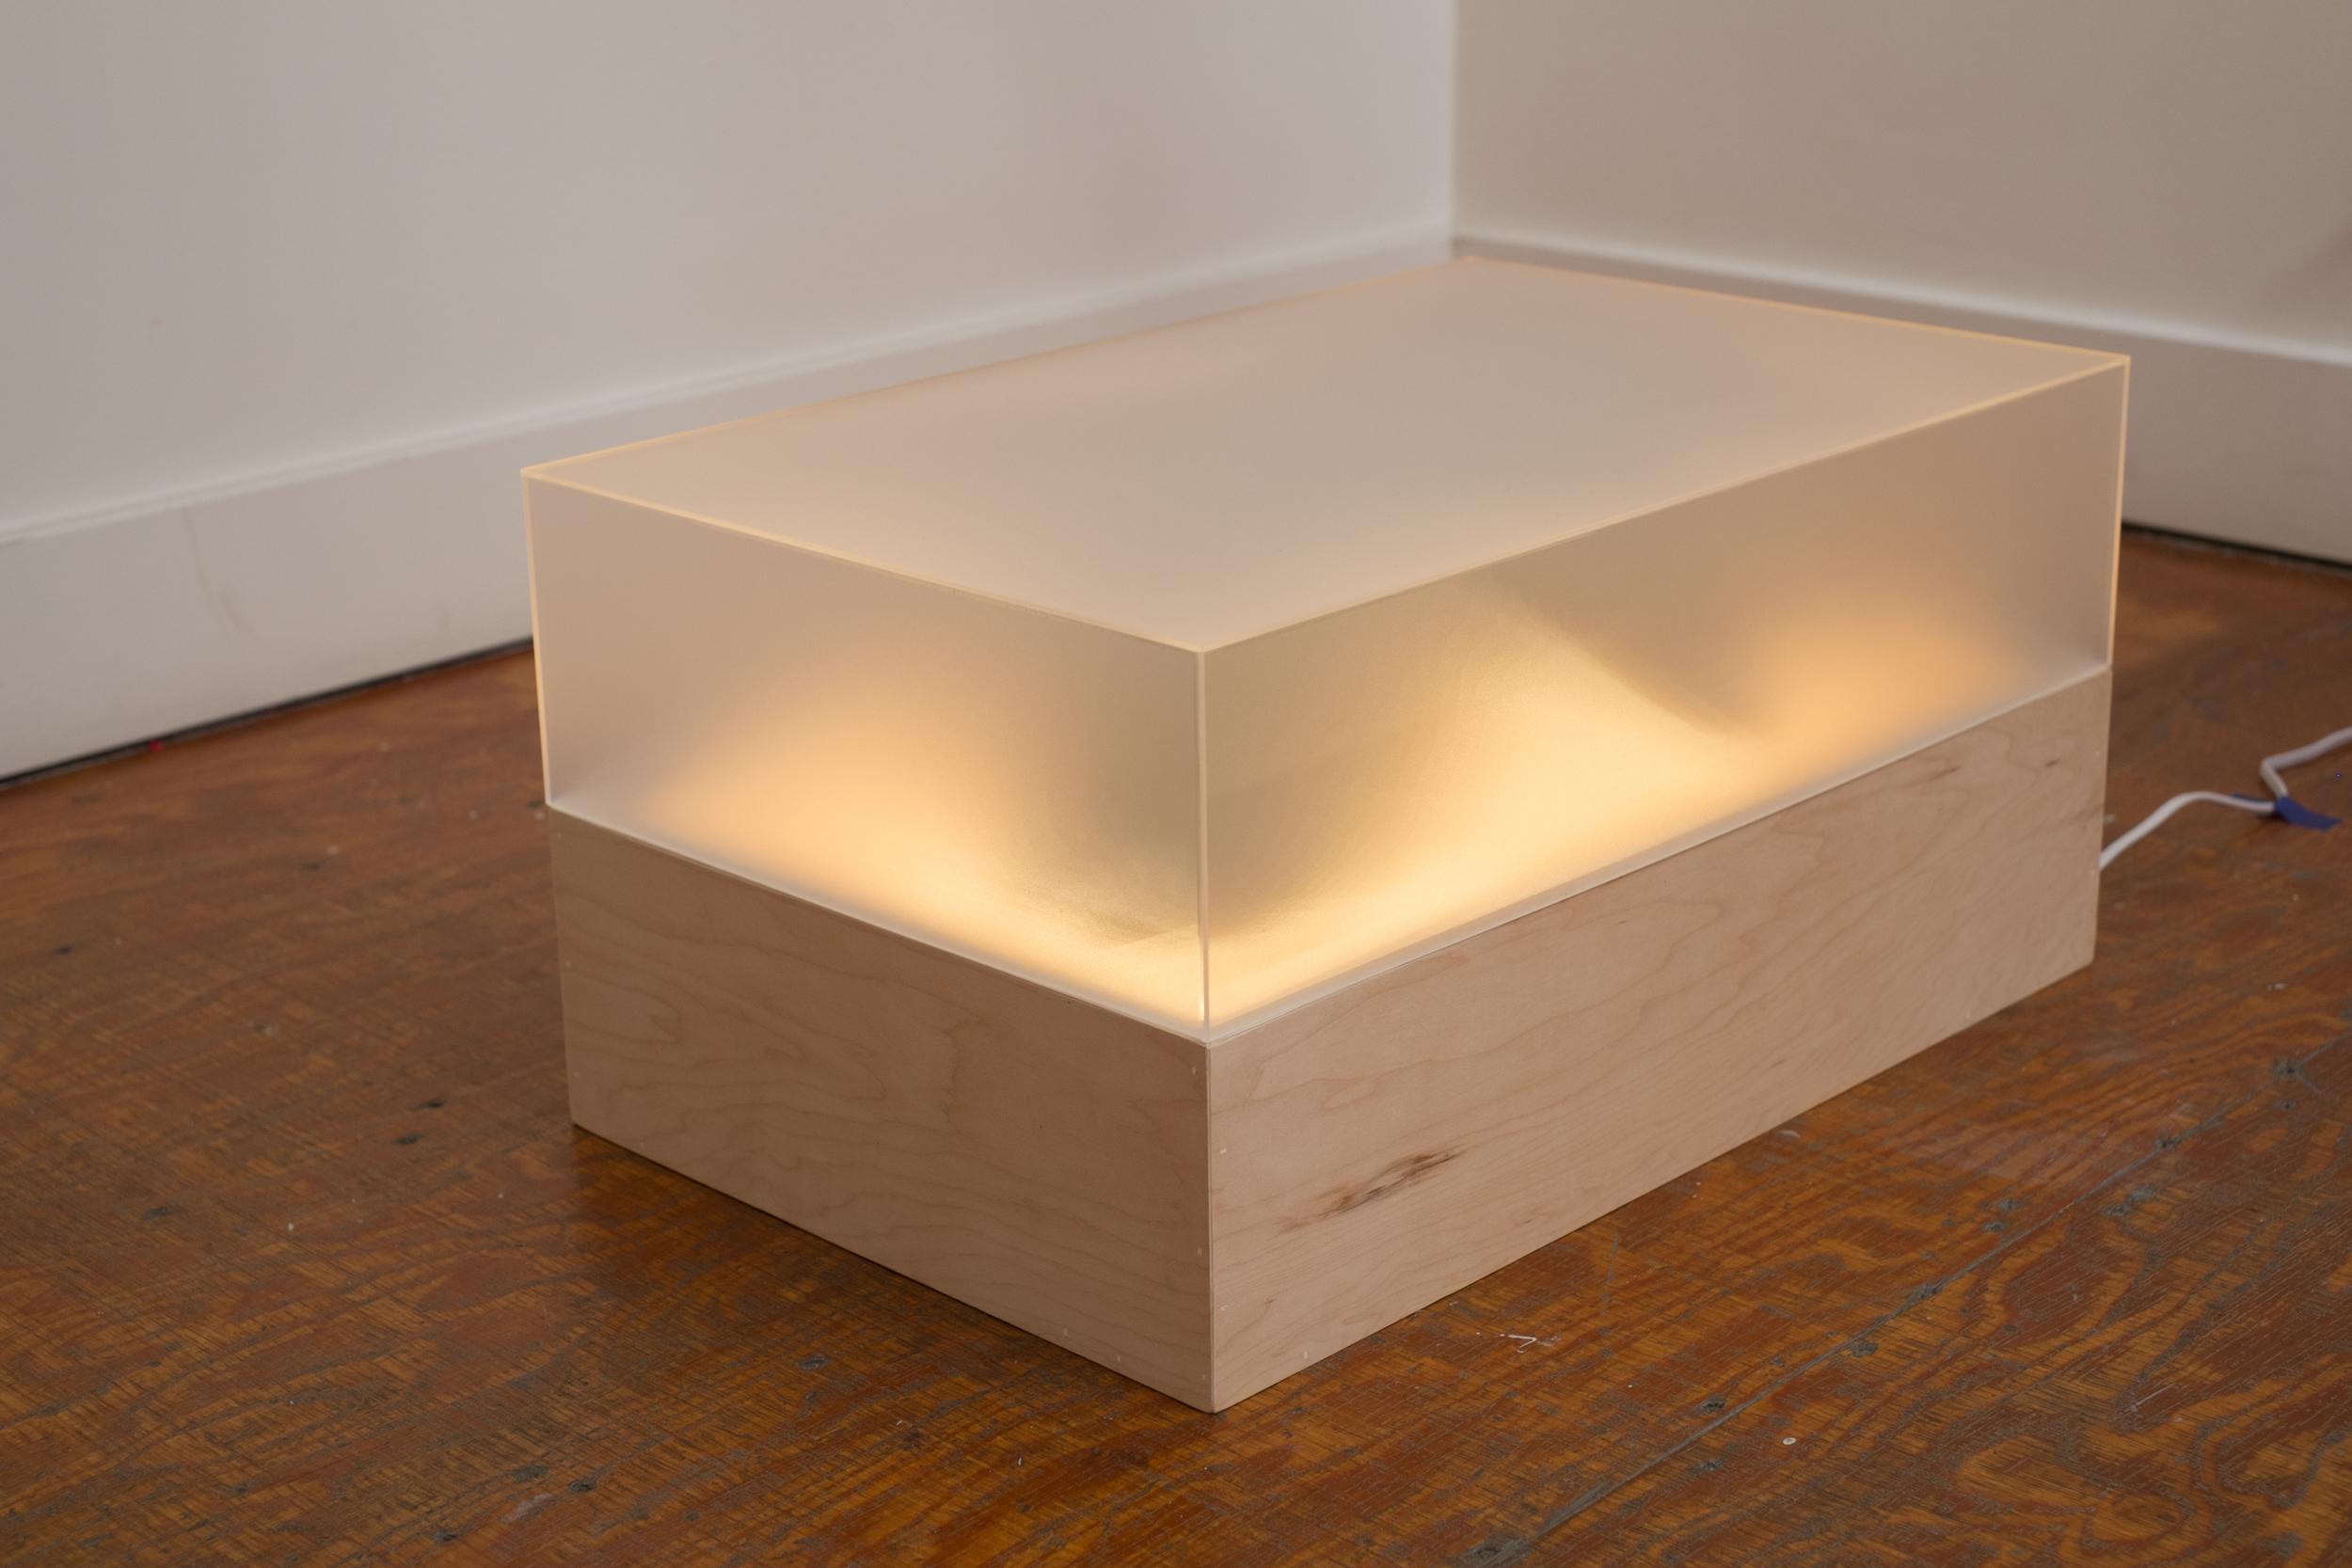 Luca Antonucci,  Ghost Victory  , 2015.    12 x 16 x 25 in.    Plexiglass  , wood, plaster, LEDs